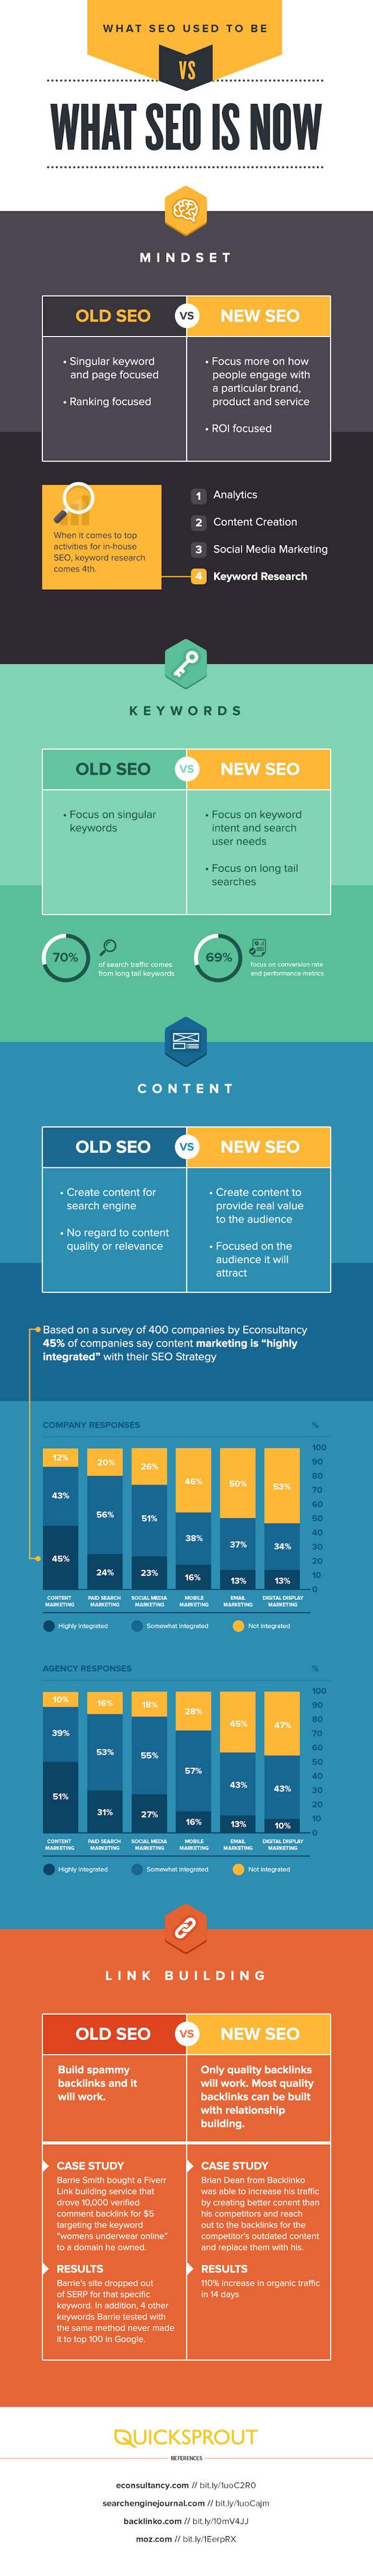 <a href='https://dragonflydigital.co.za/search-engine-optimisation' alt='seo companies, Johannesburg South Africa'>SEO</a> infographic